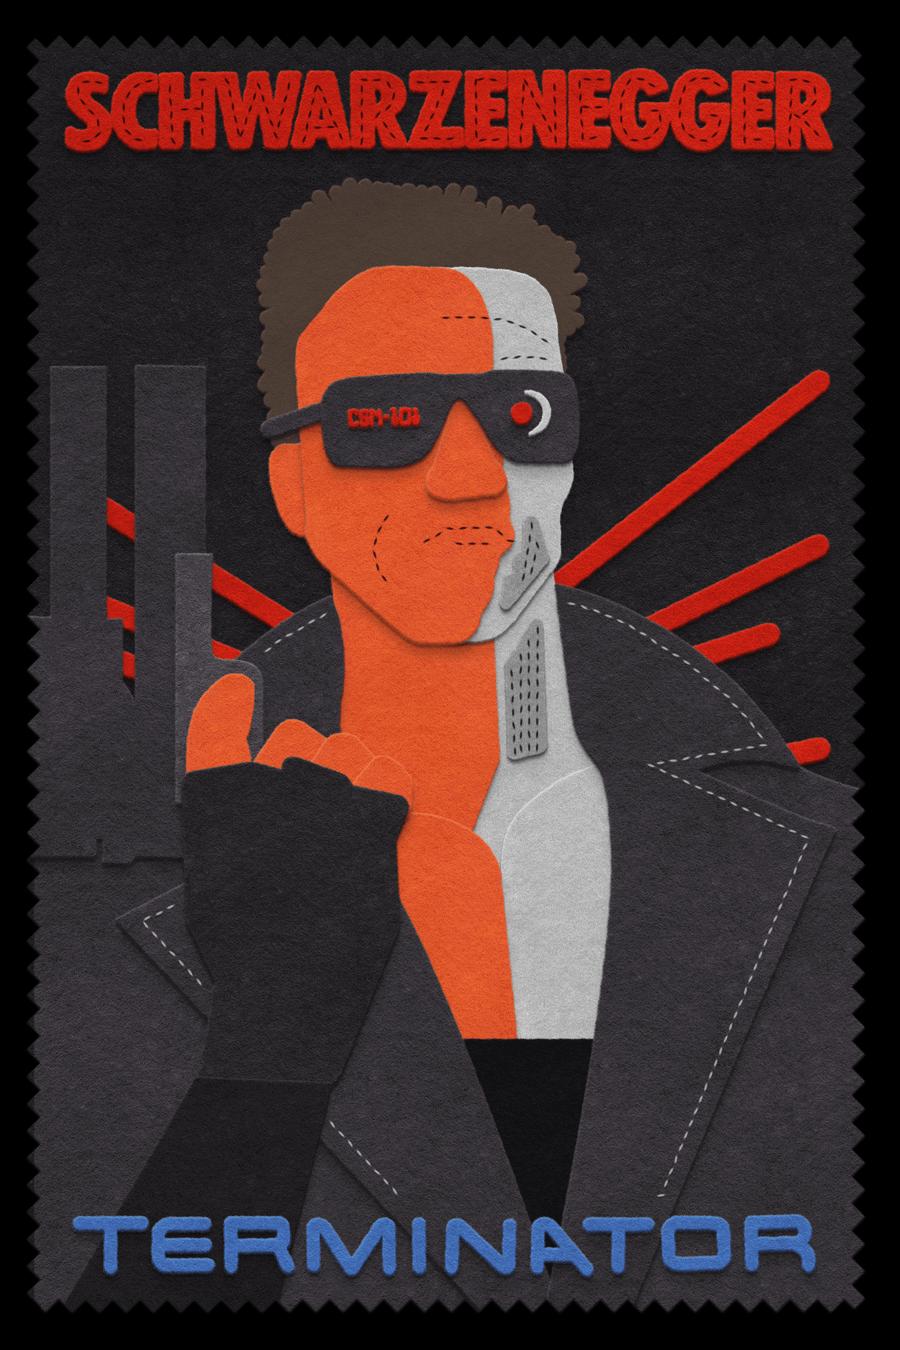 The Terminator  felt design